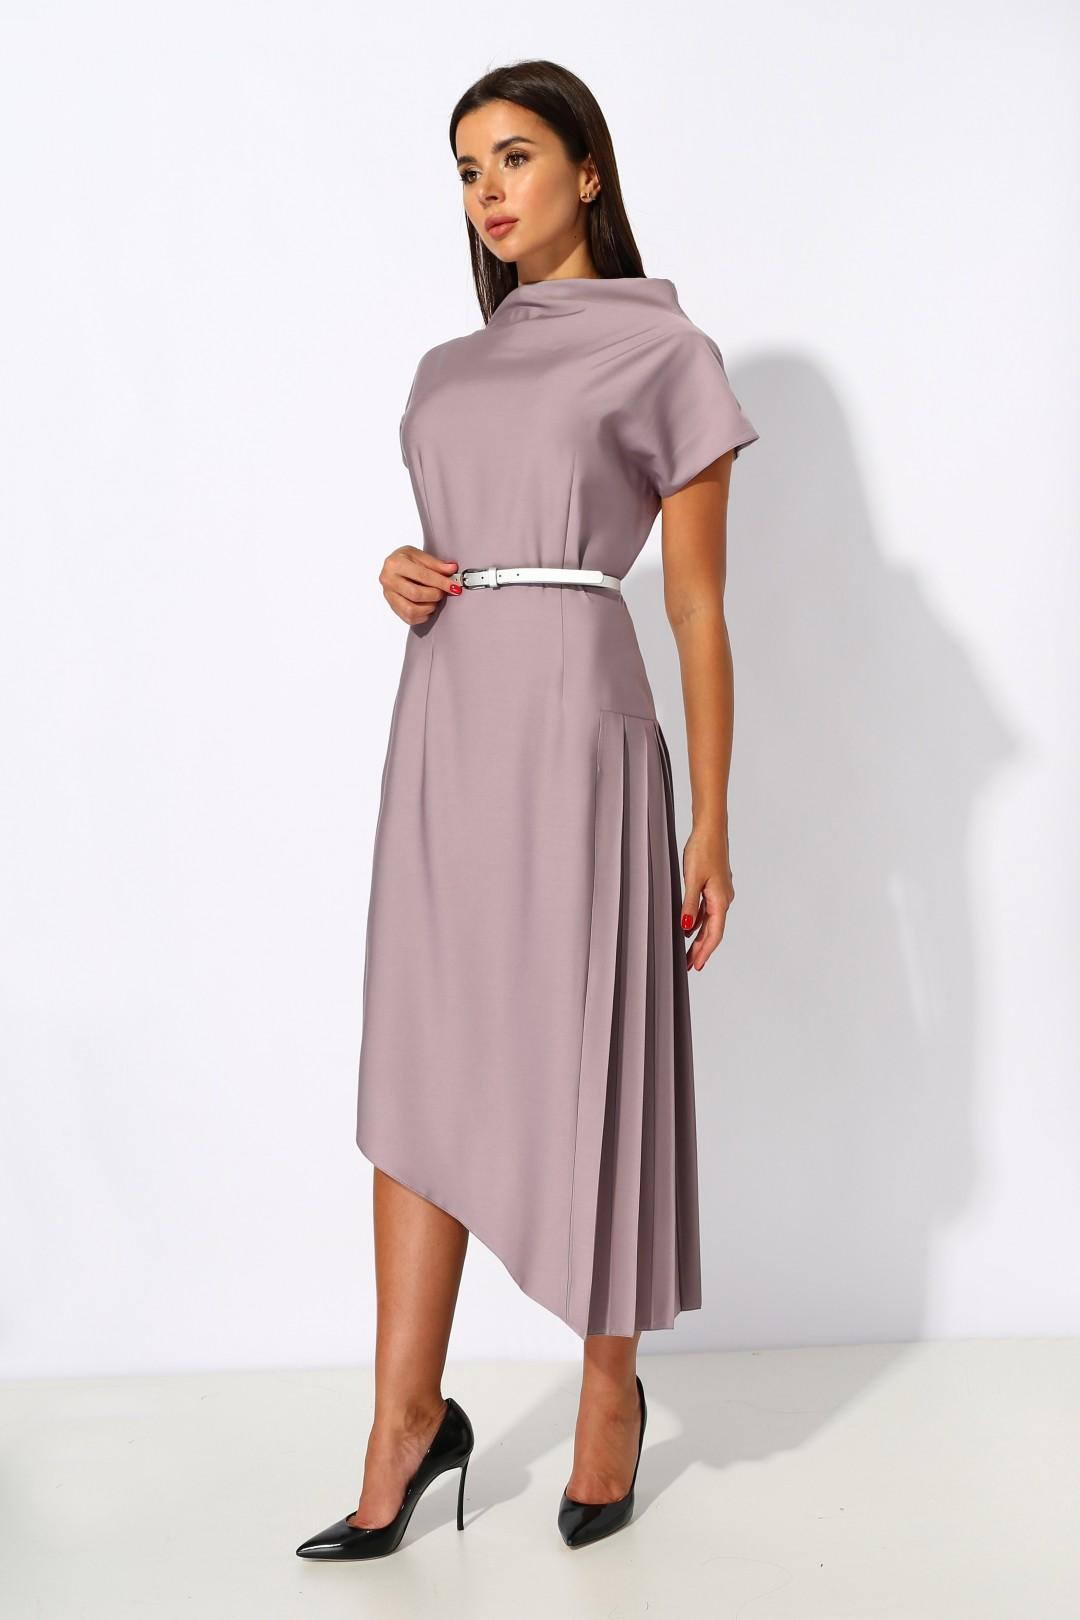 Платье МиА-Мода 1053-4 капучино